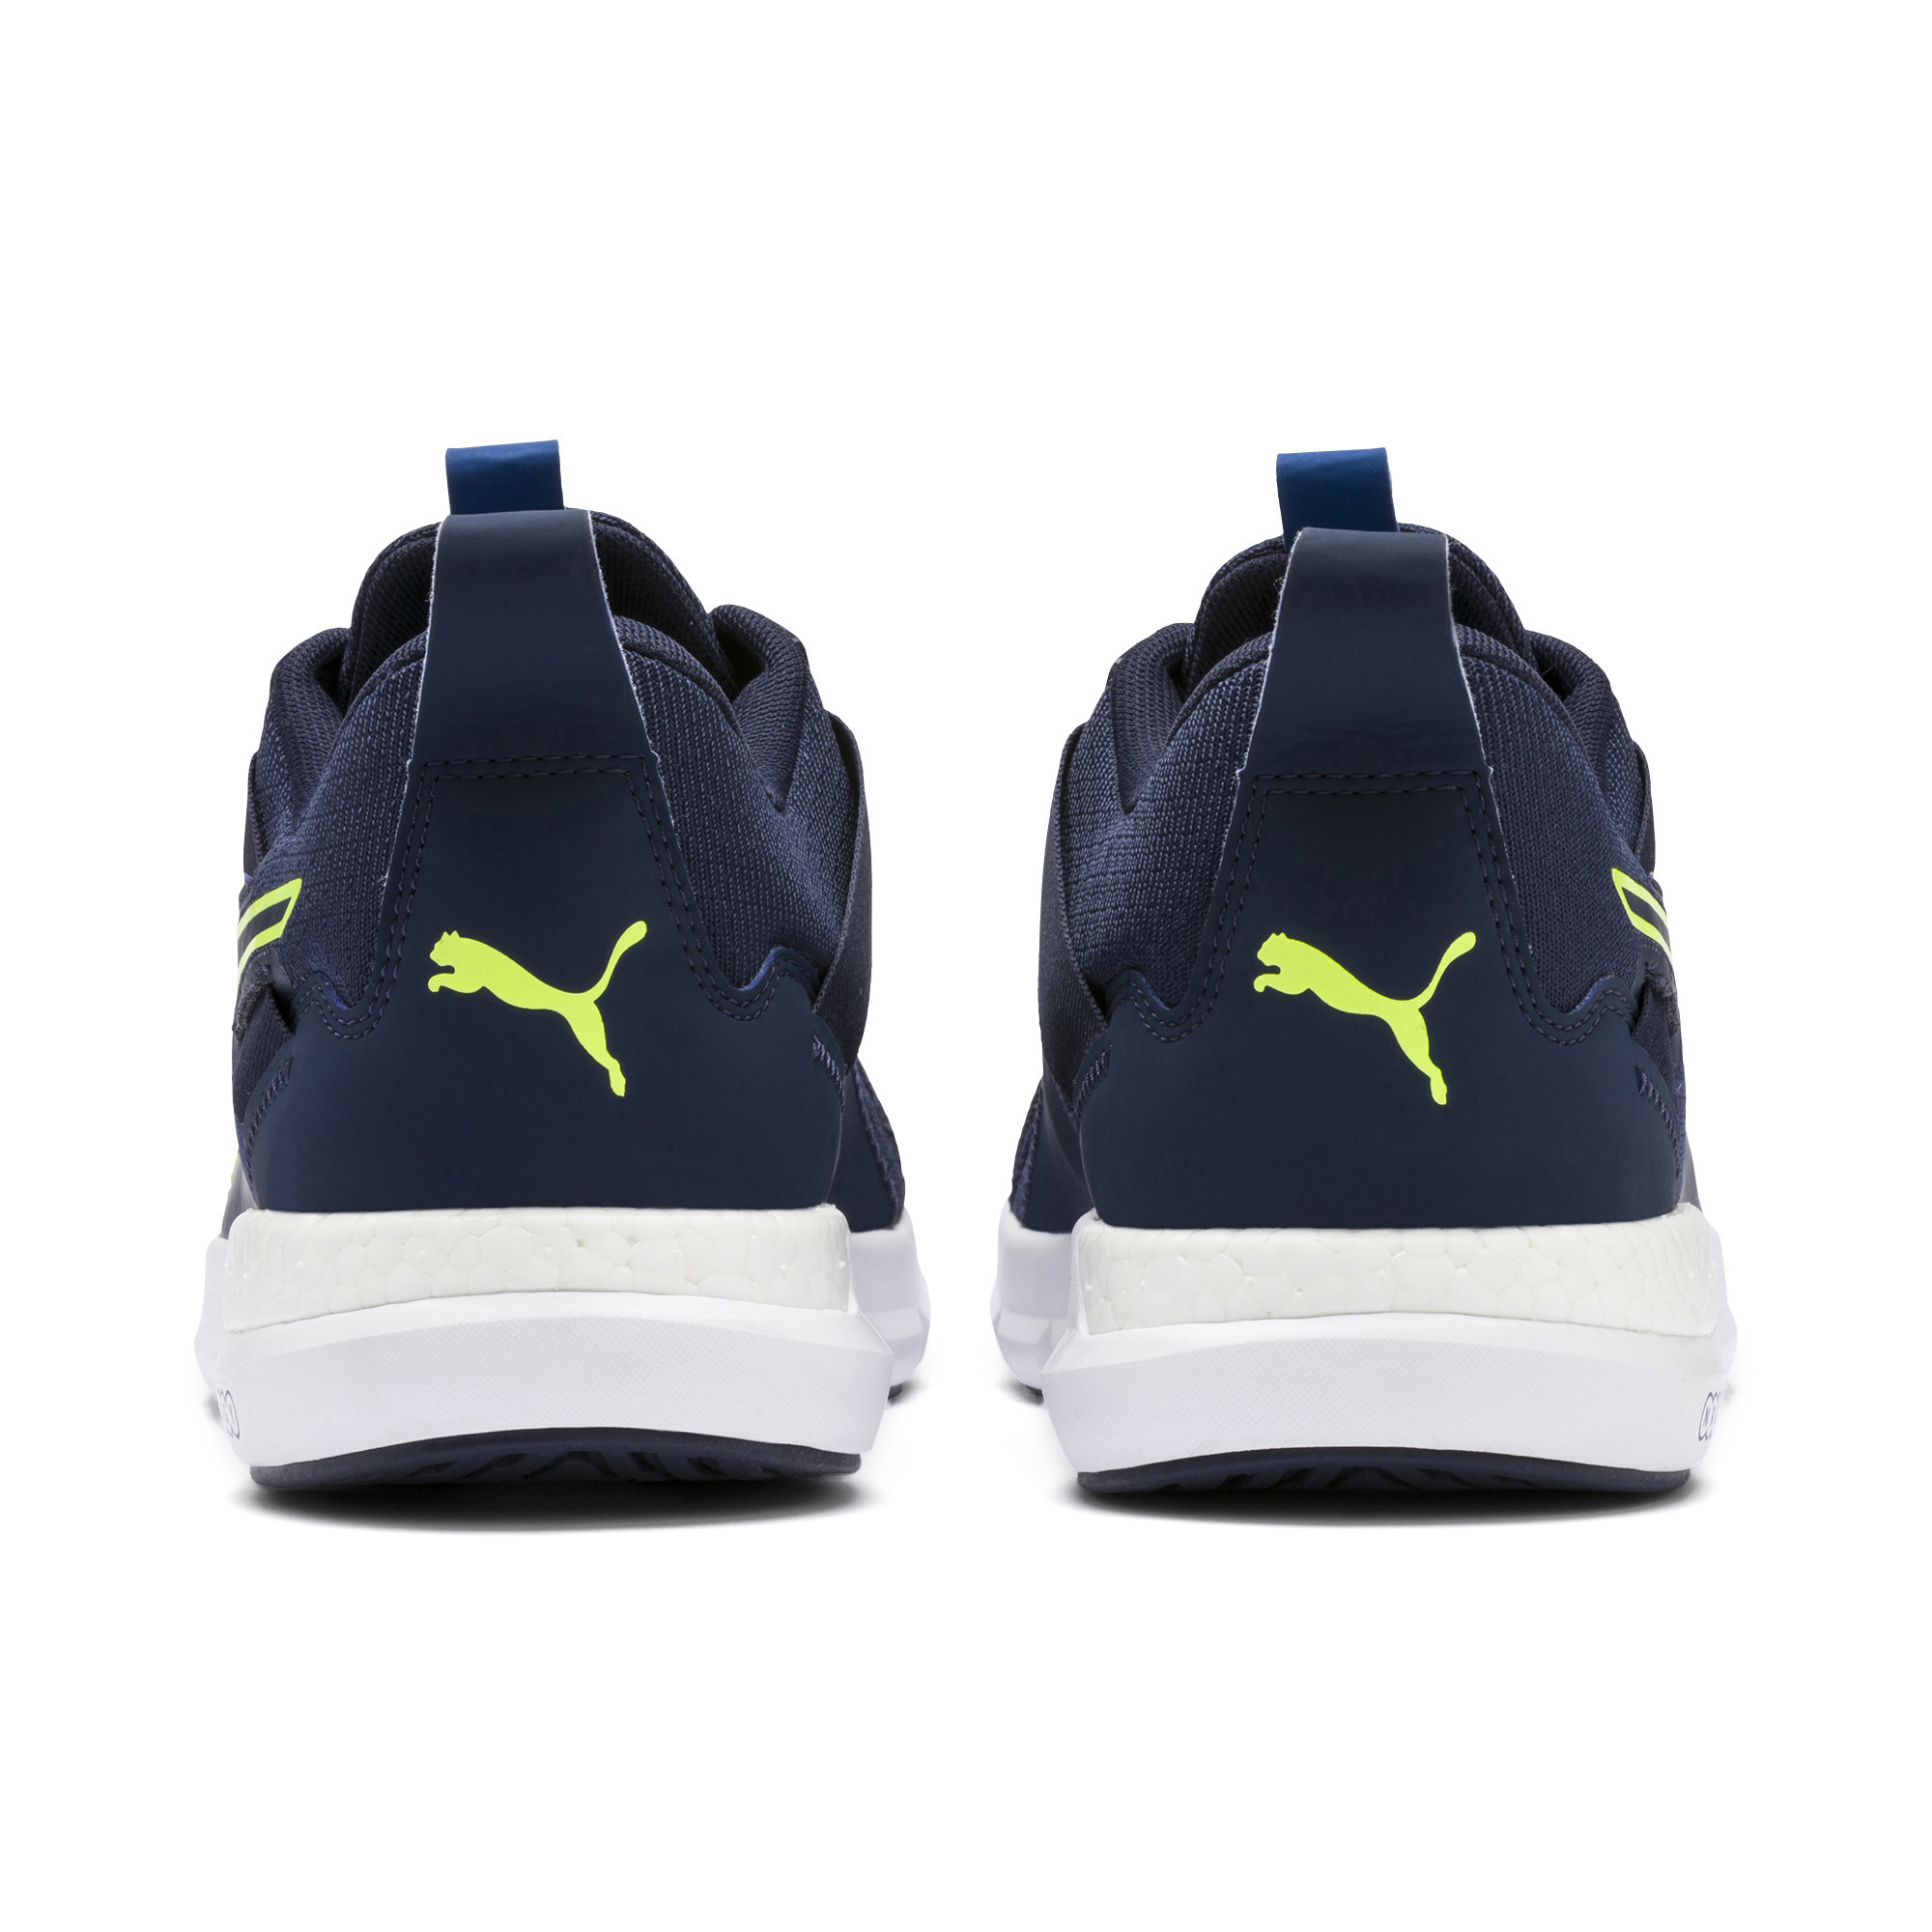 PUMA-NRGY-Dynamo-Futuro-Men-039-s-Running-Shoes-Men-Shoe-Running thumbnail 3